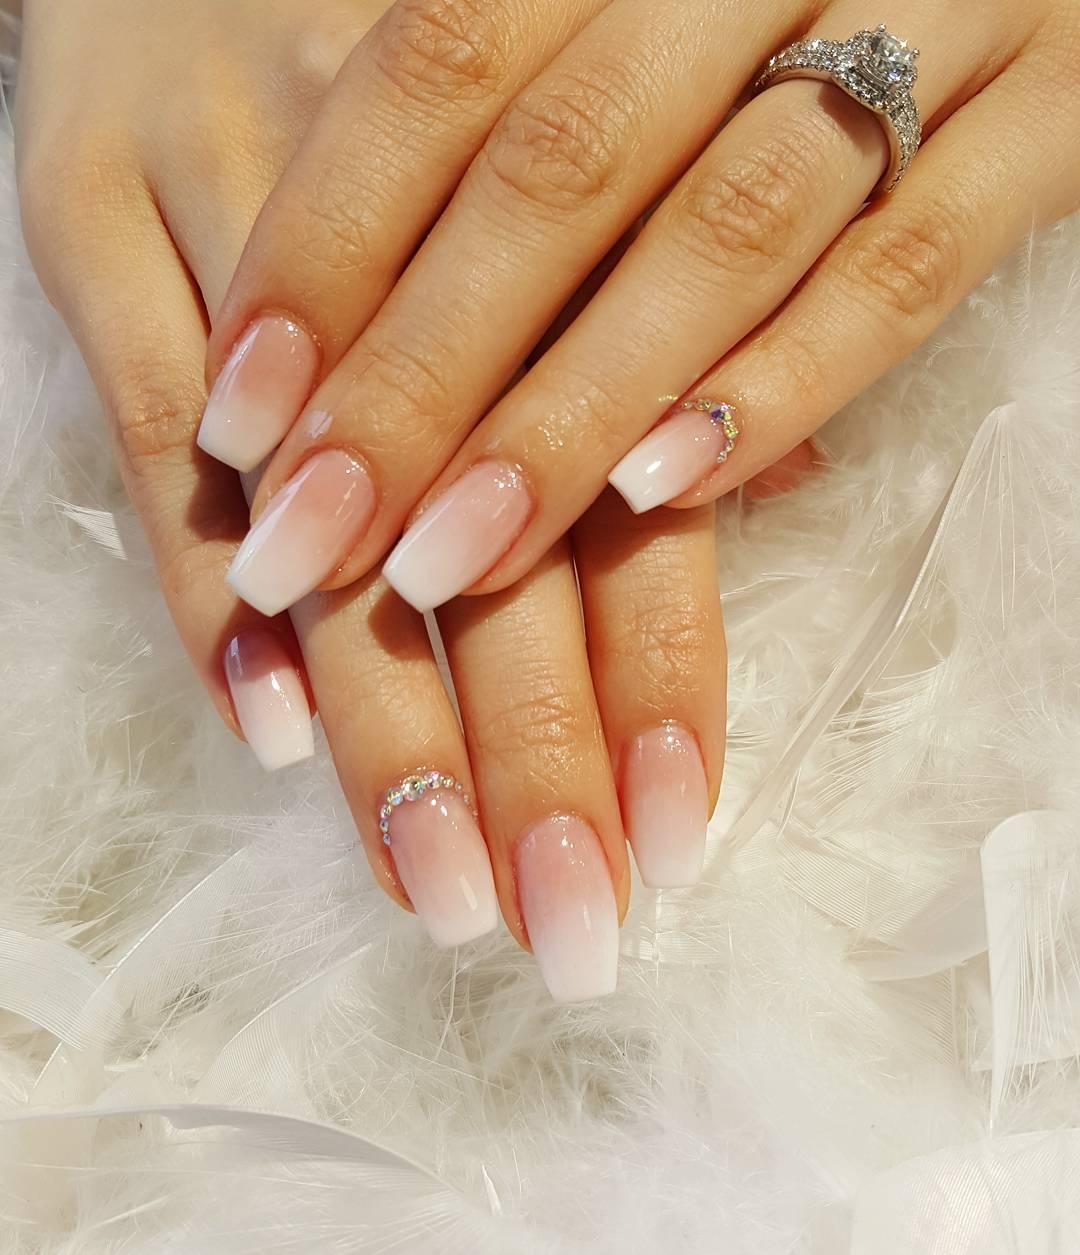 acrylic nails or gel photo - 2